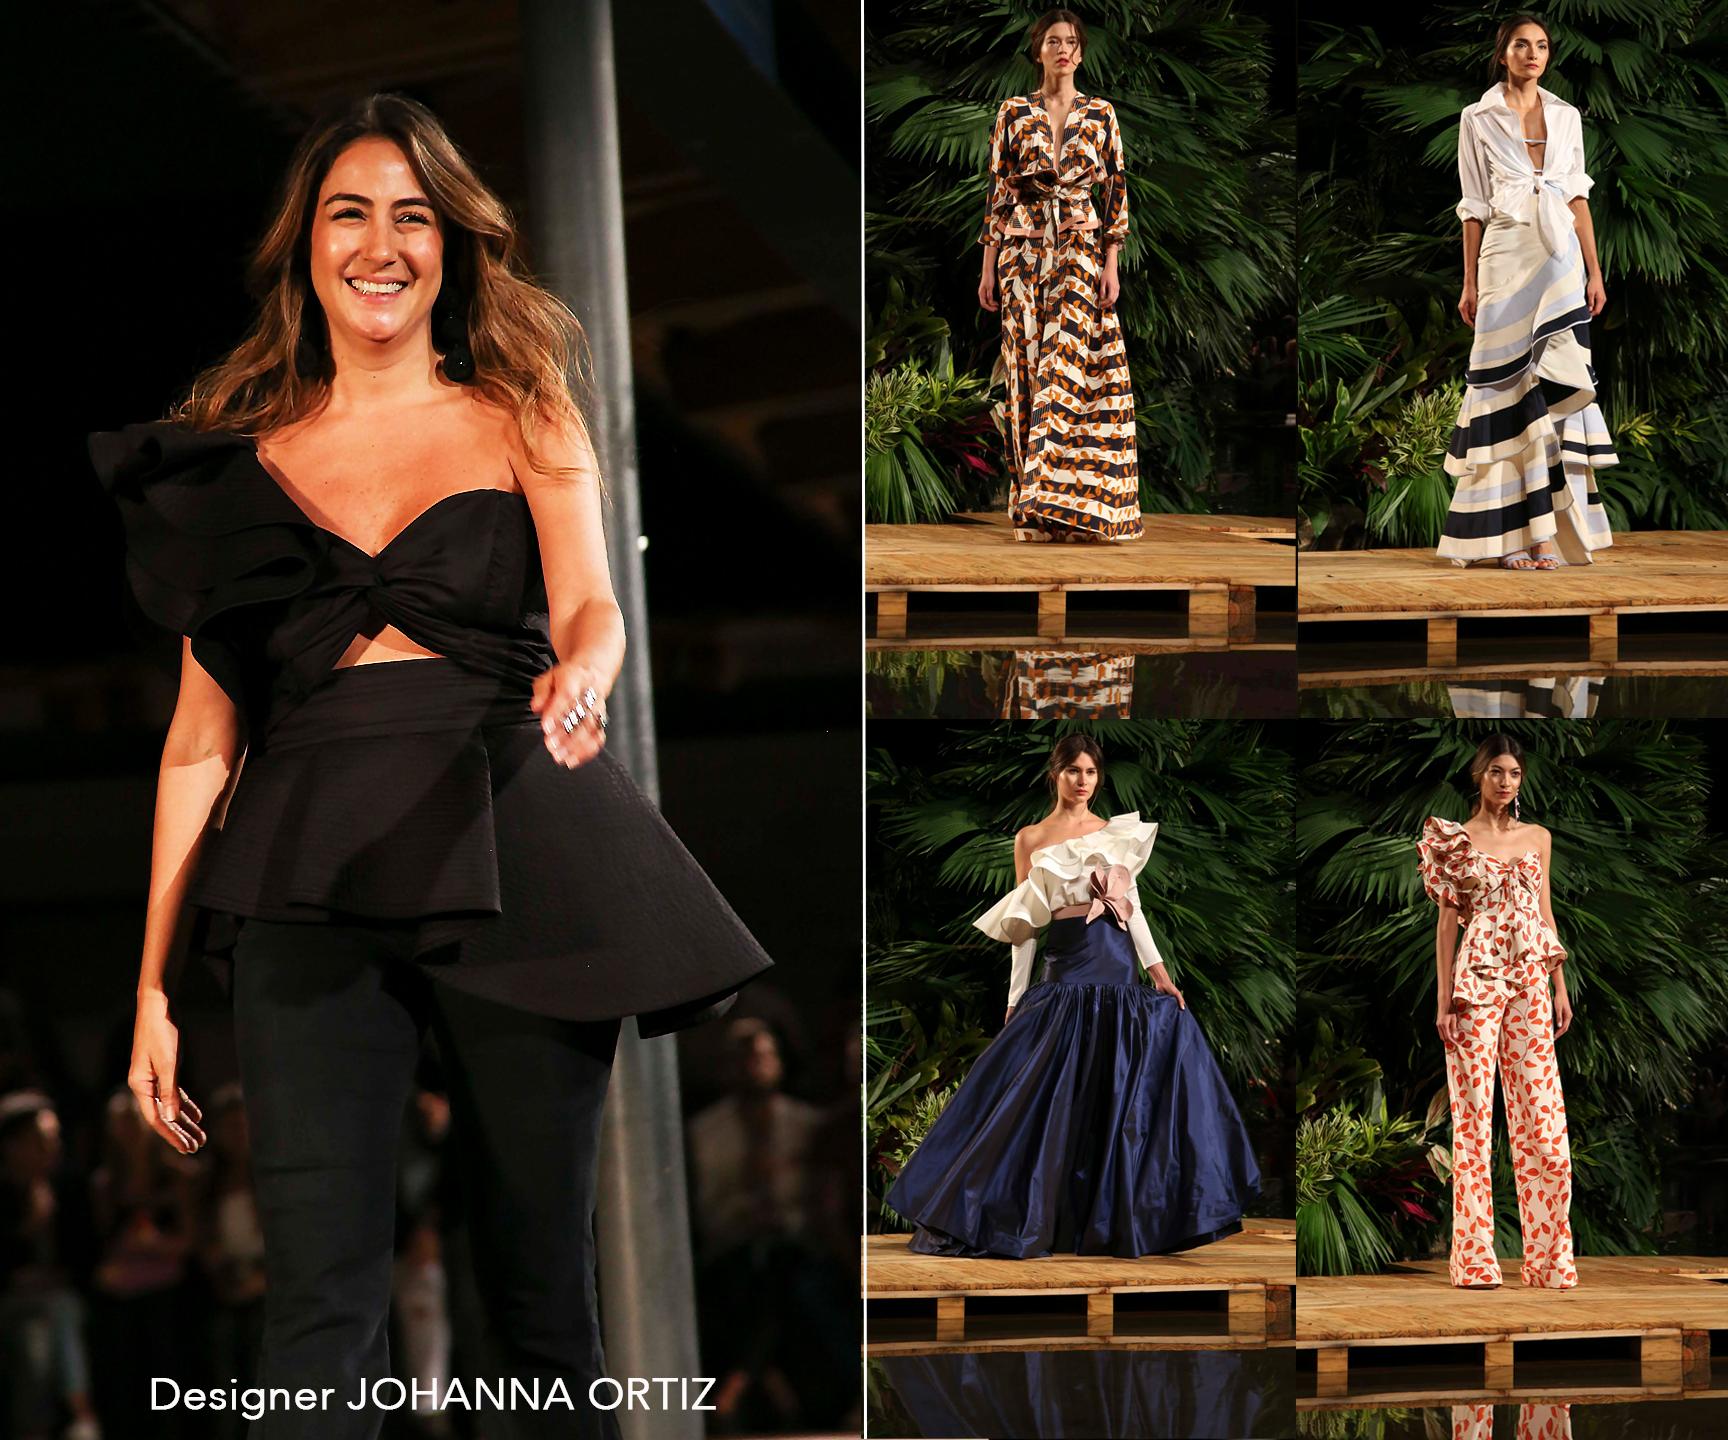 Colombian Designers - Johanna Ortiz